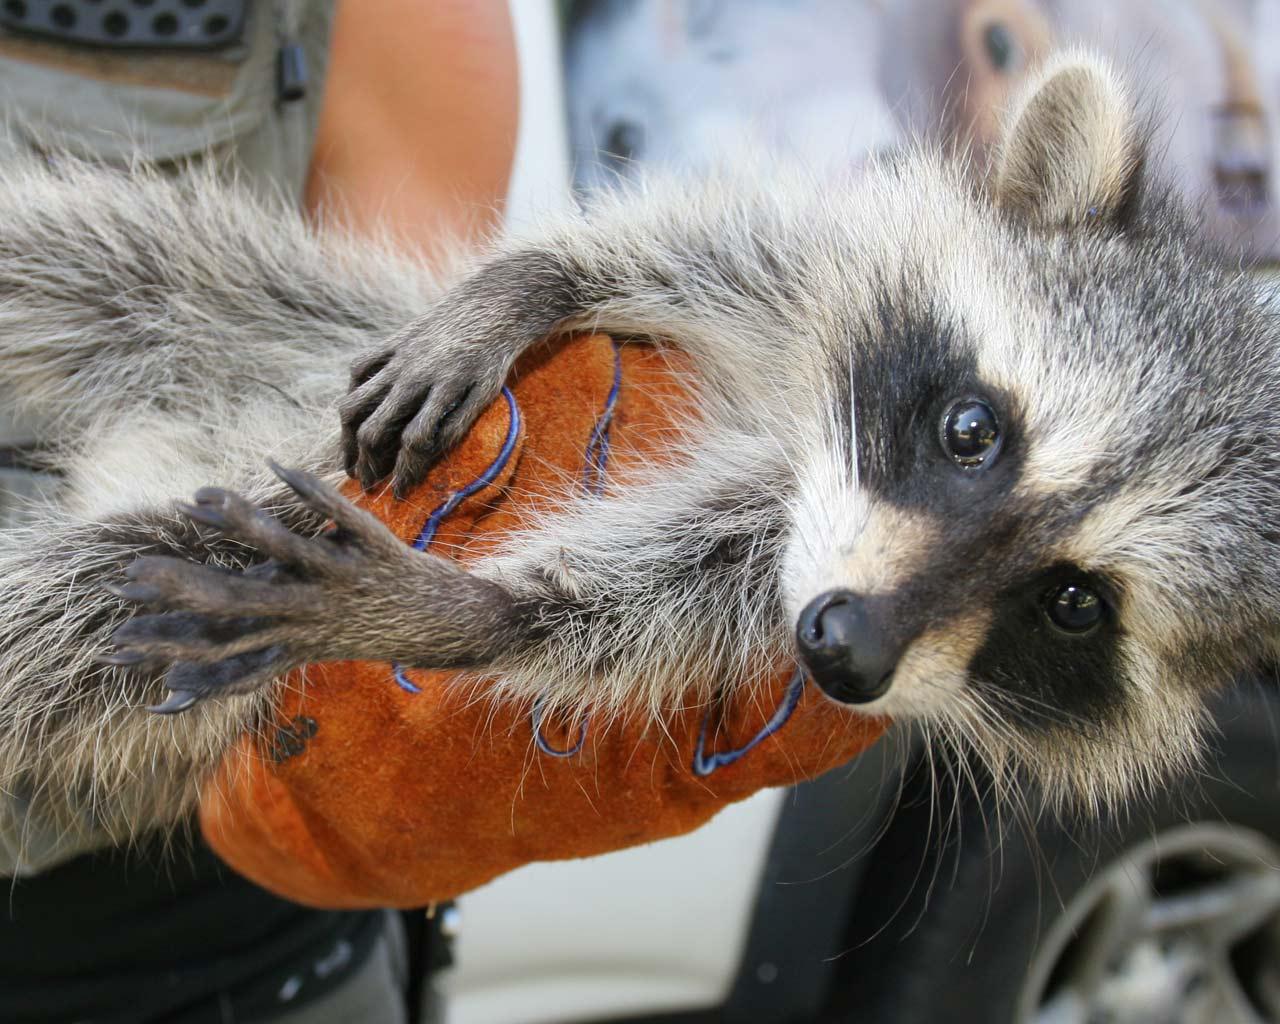 Baby Raccoon Wallpaper Baby Raccoon Wallpaper 1280x1024